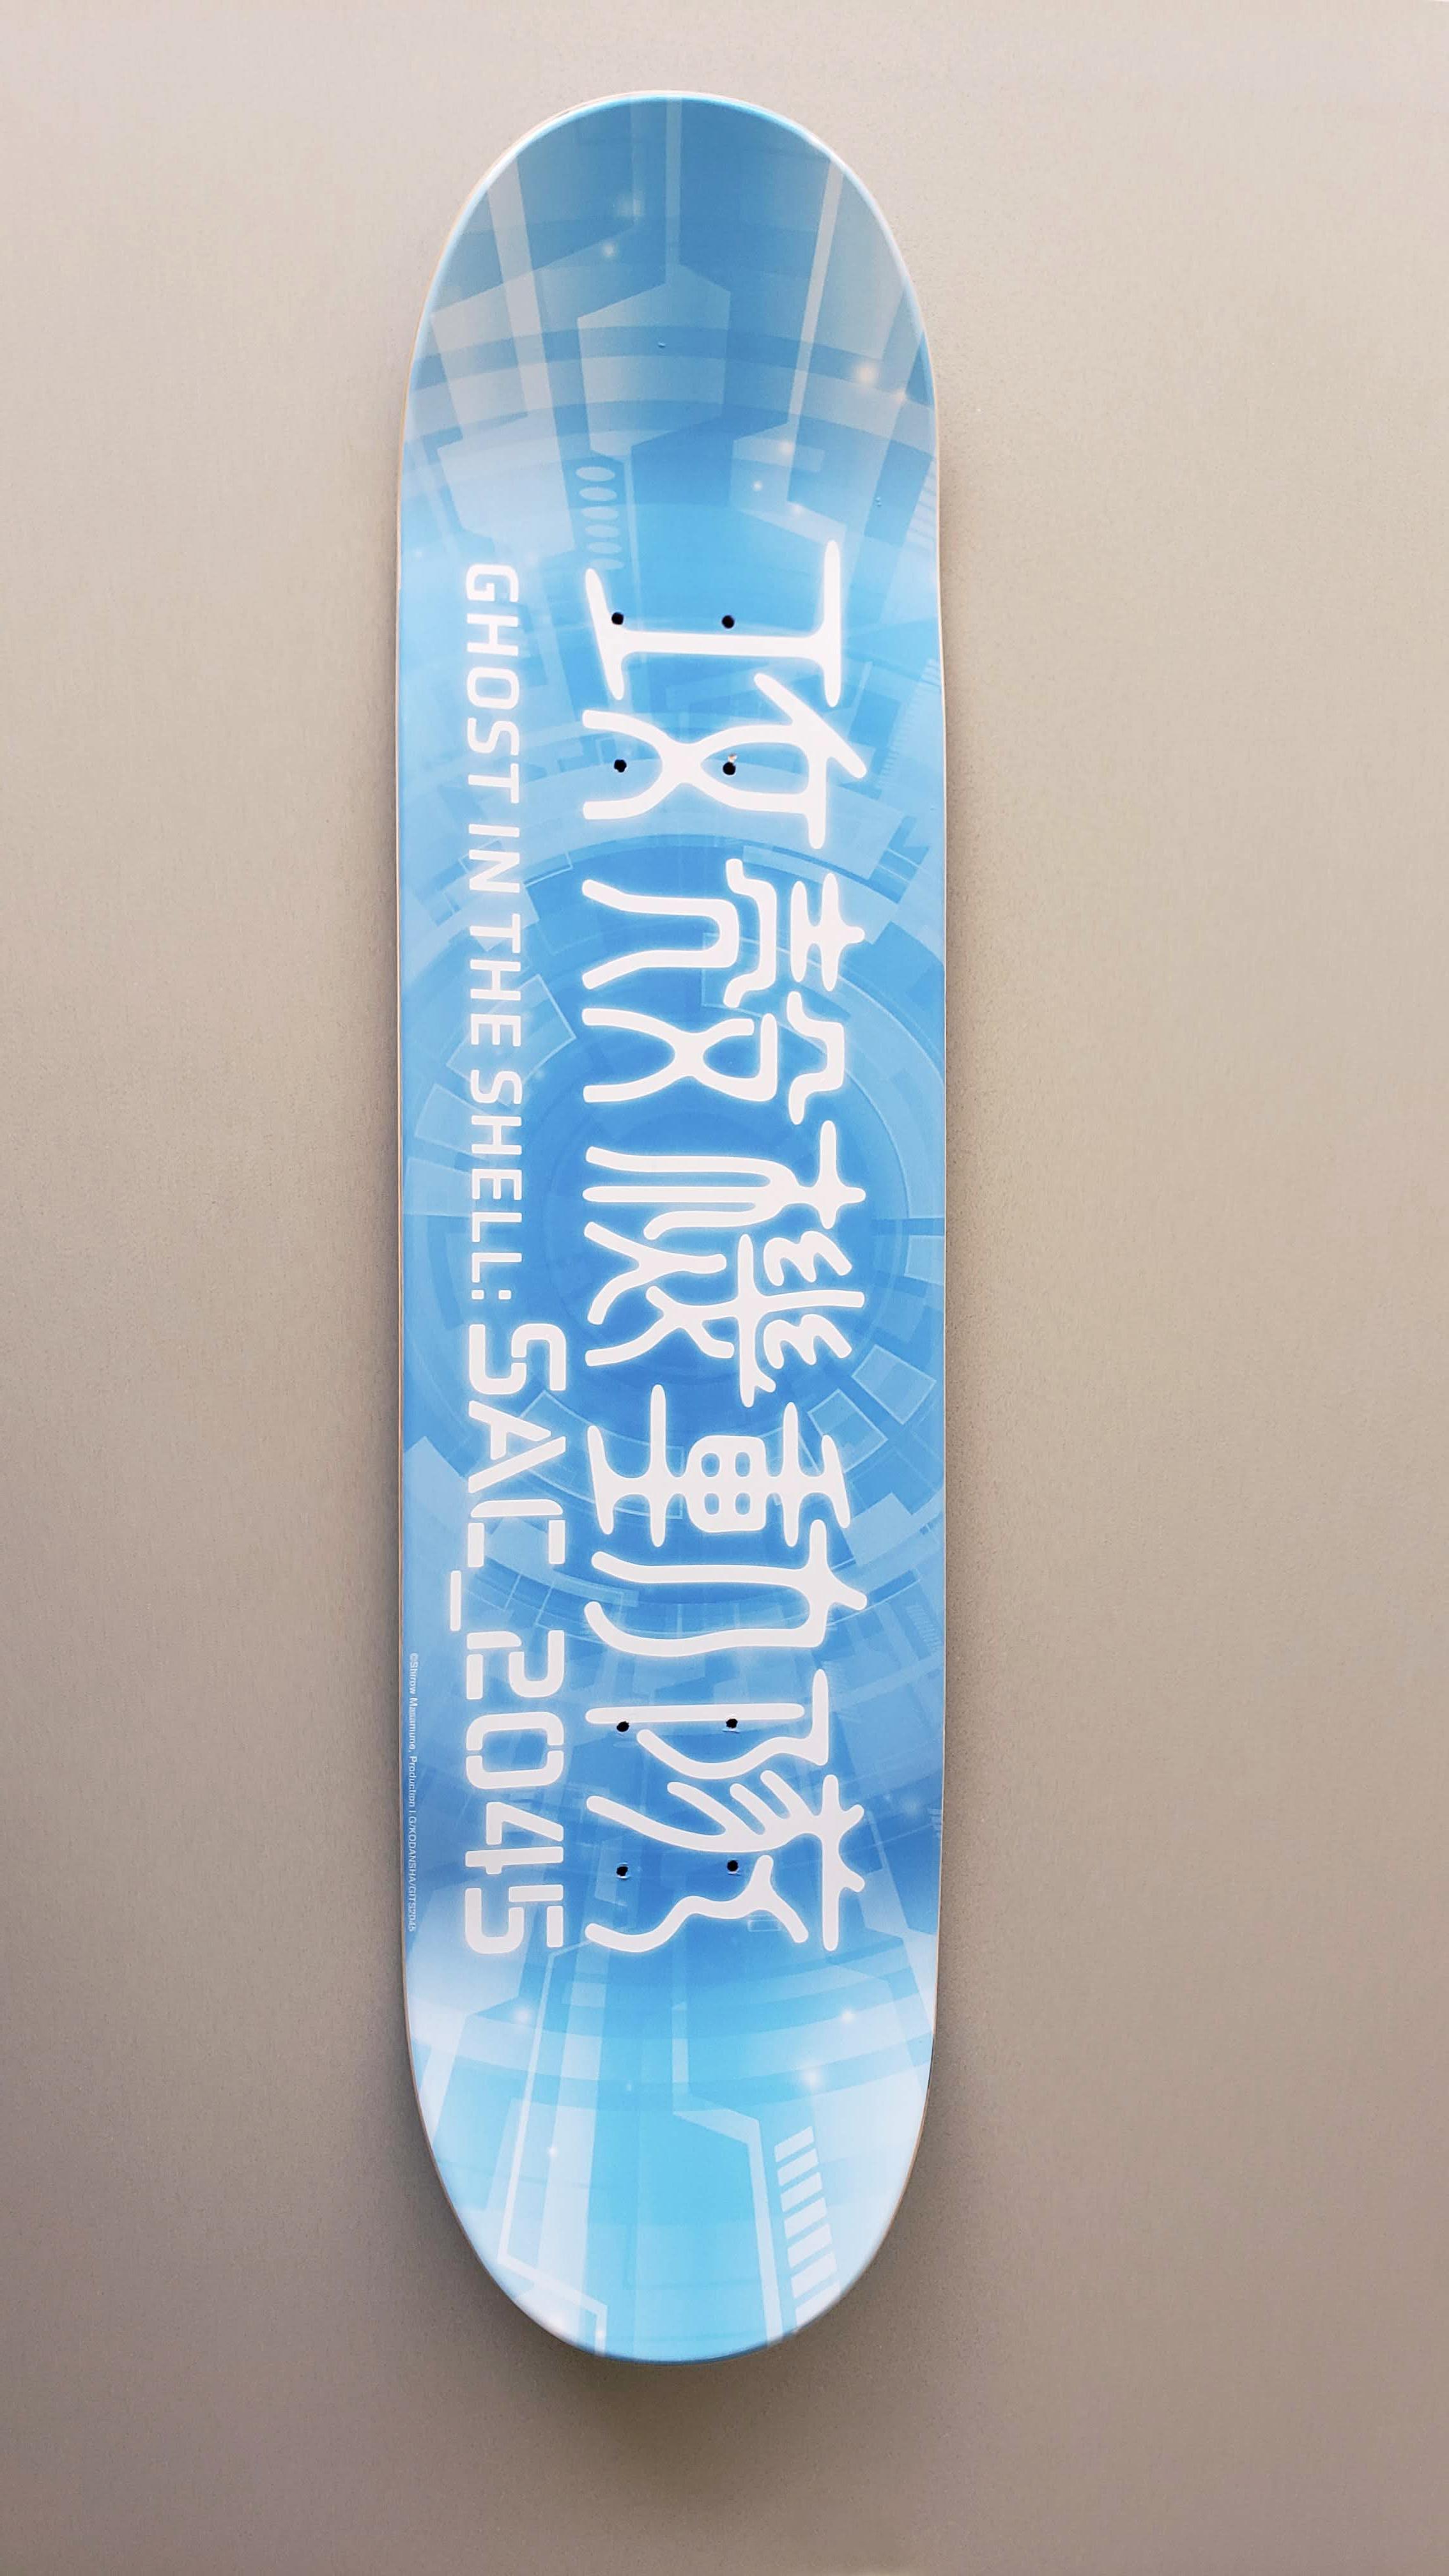 GHOST IN THE SHELL: SAC_2045 Motoko Kusanagi Skateboard Deck [September 2021 Delivery]